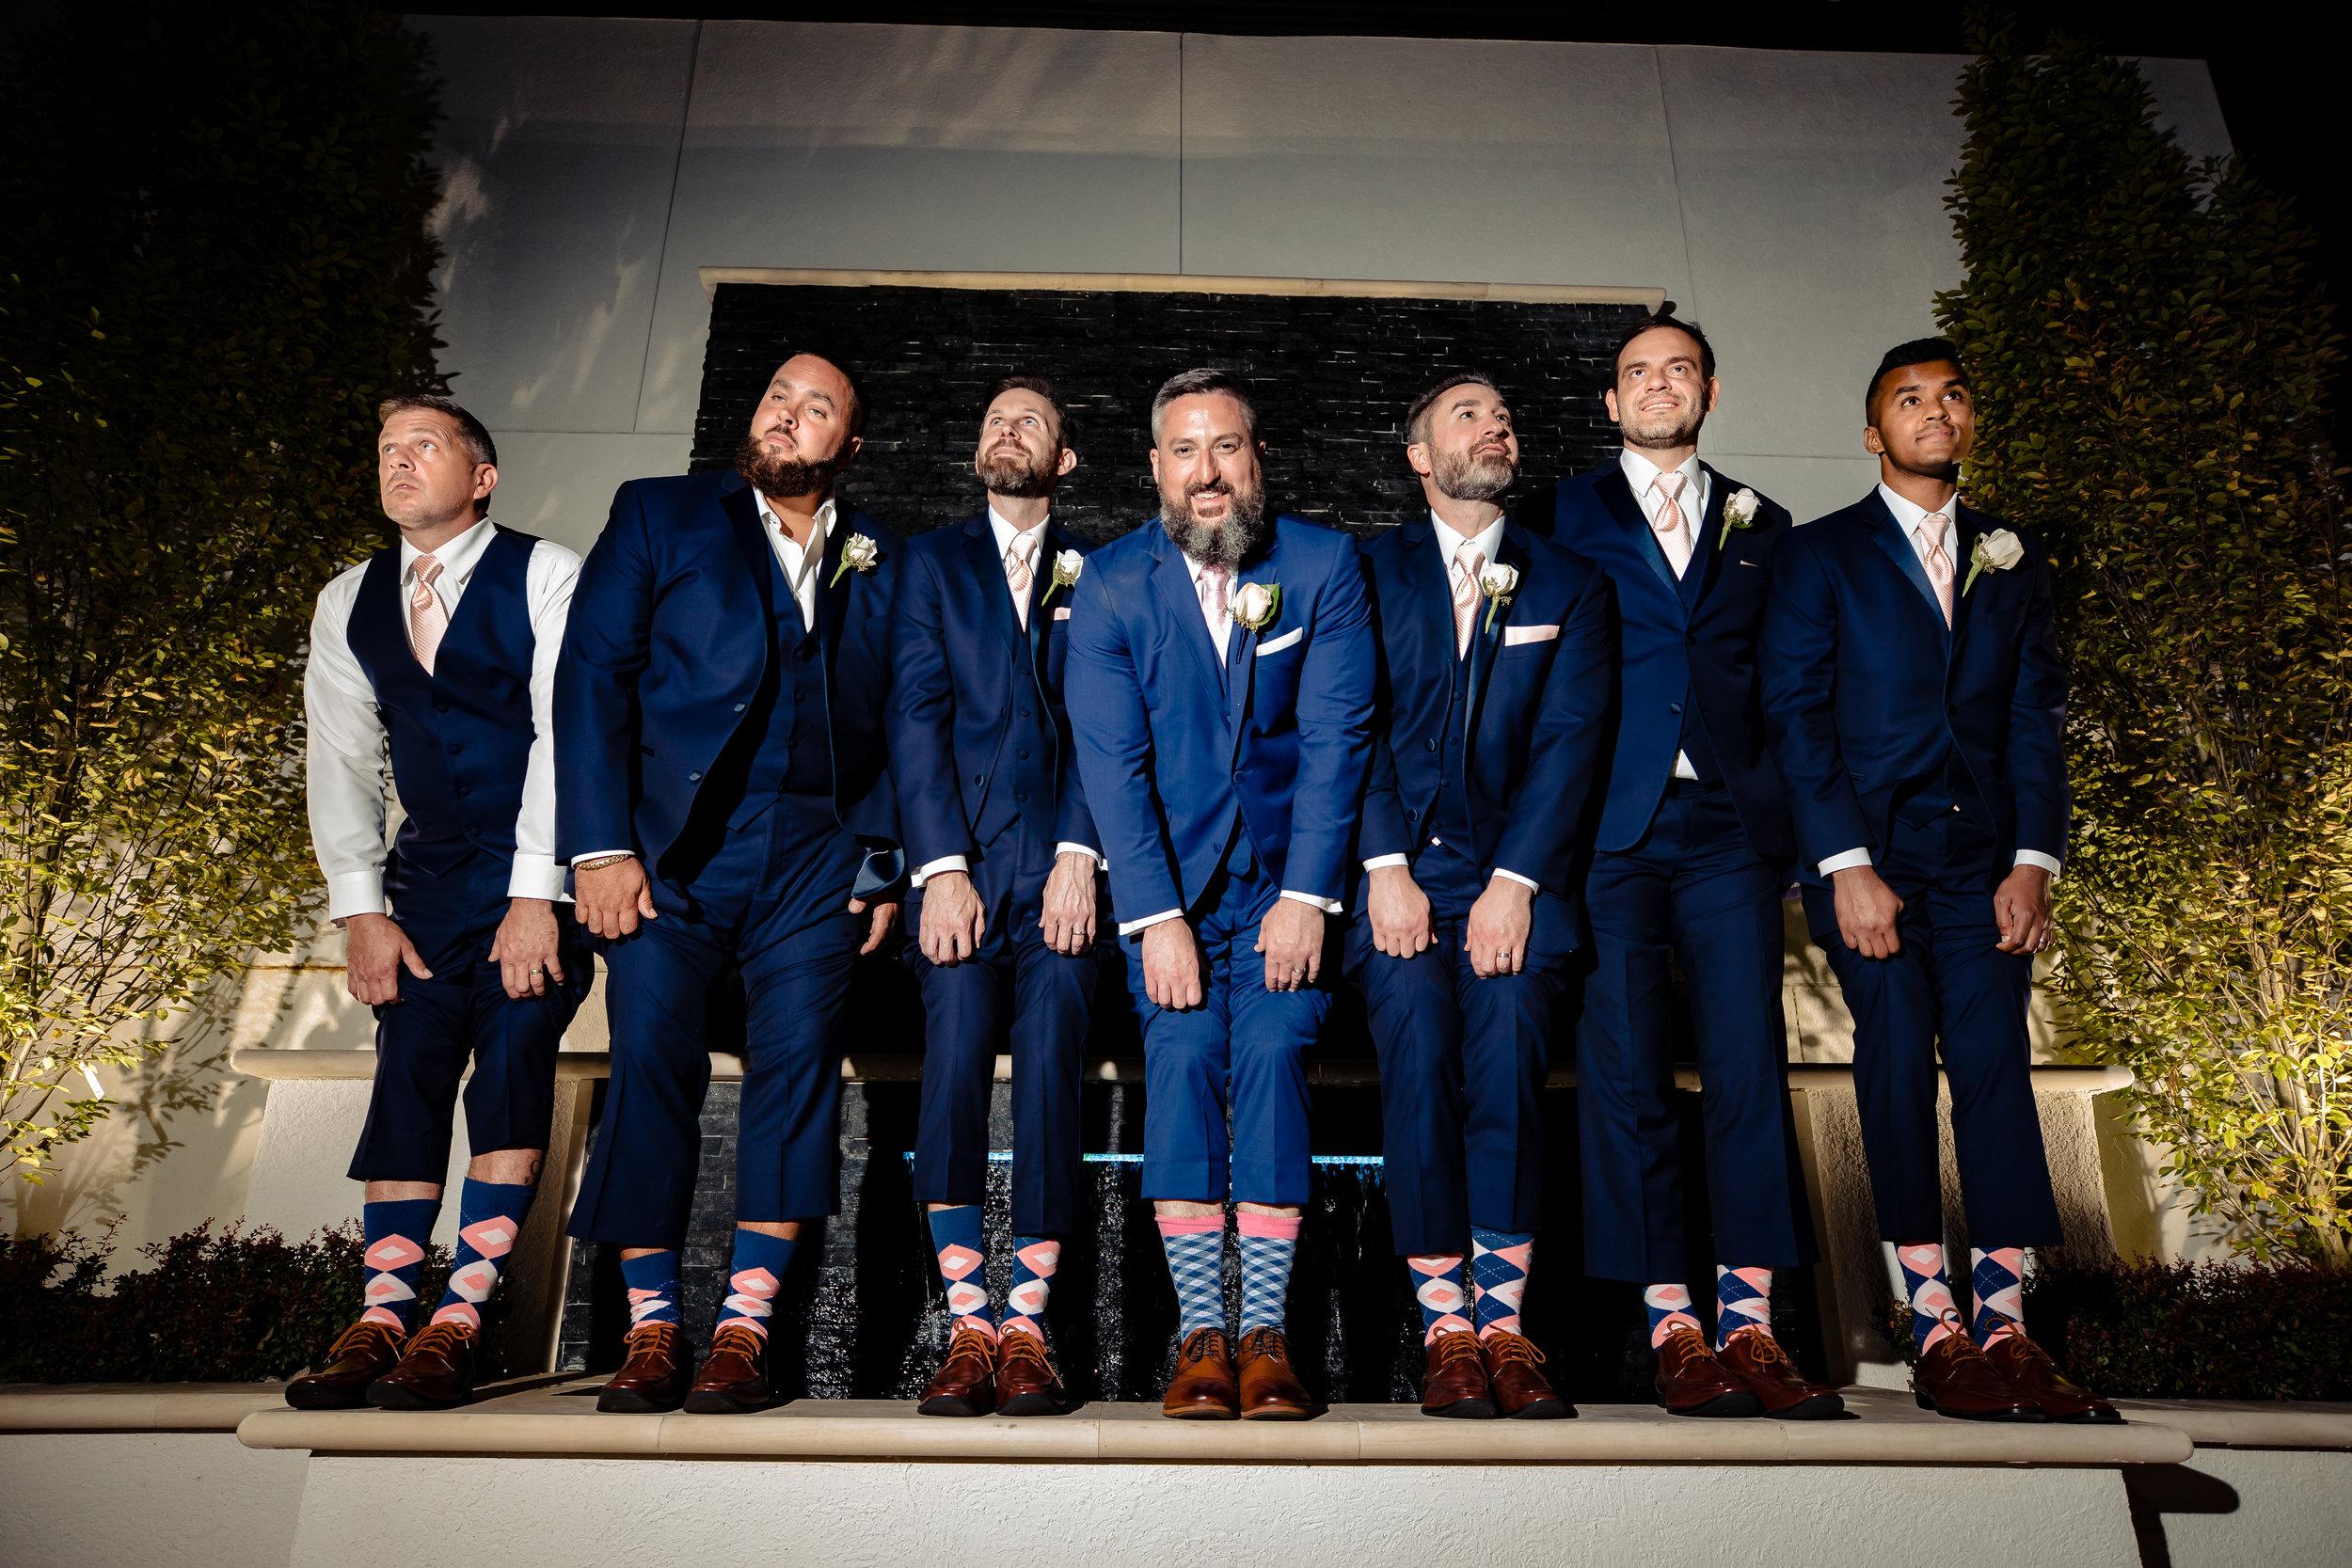 groomsmen lifting their pant legs to show their matching socks